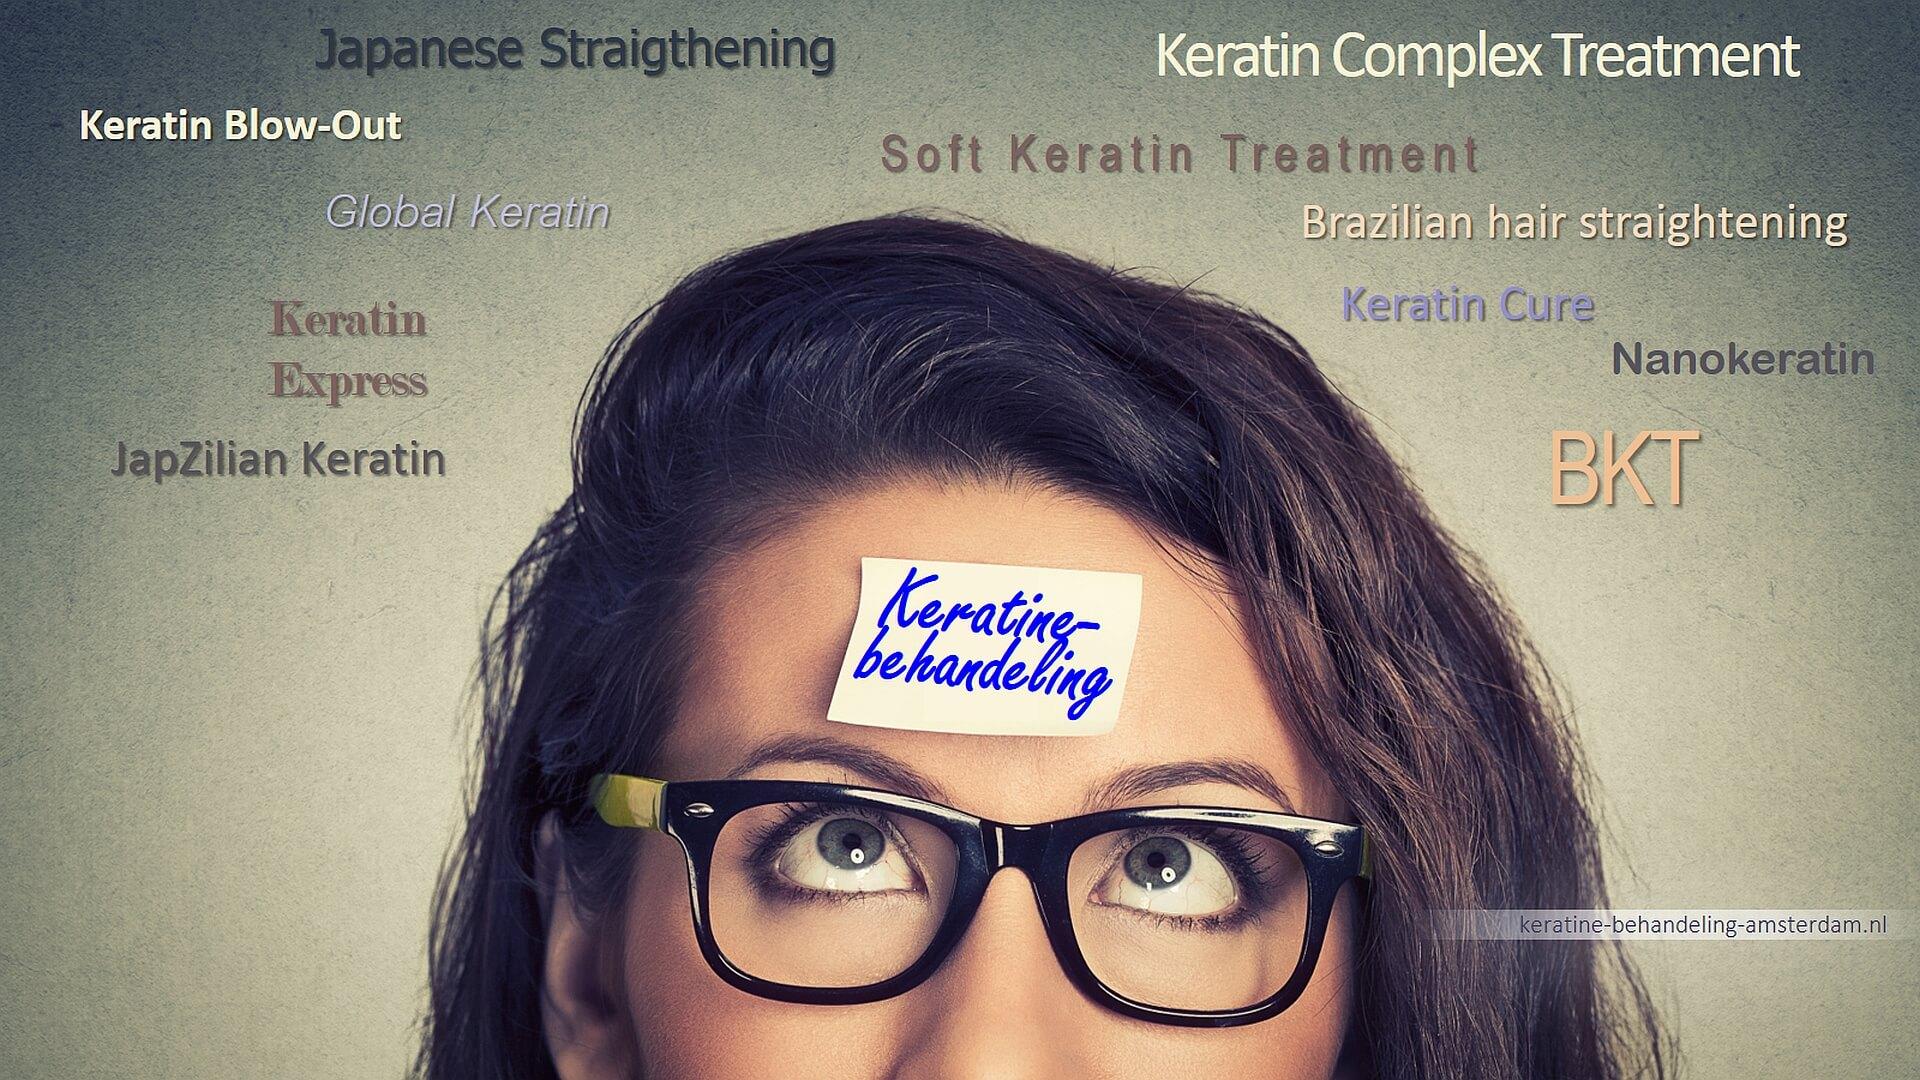 Keratine Veelgestelde Vragen Behandeling Amsterdam Kapper 2017 LysandroCicilia hairstyles